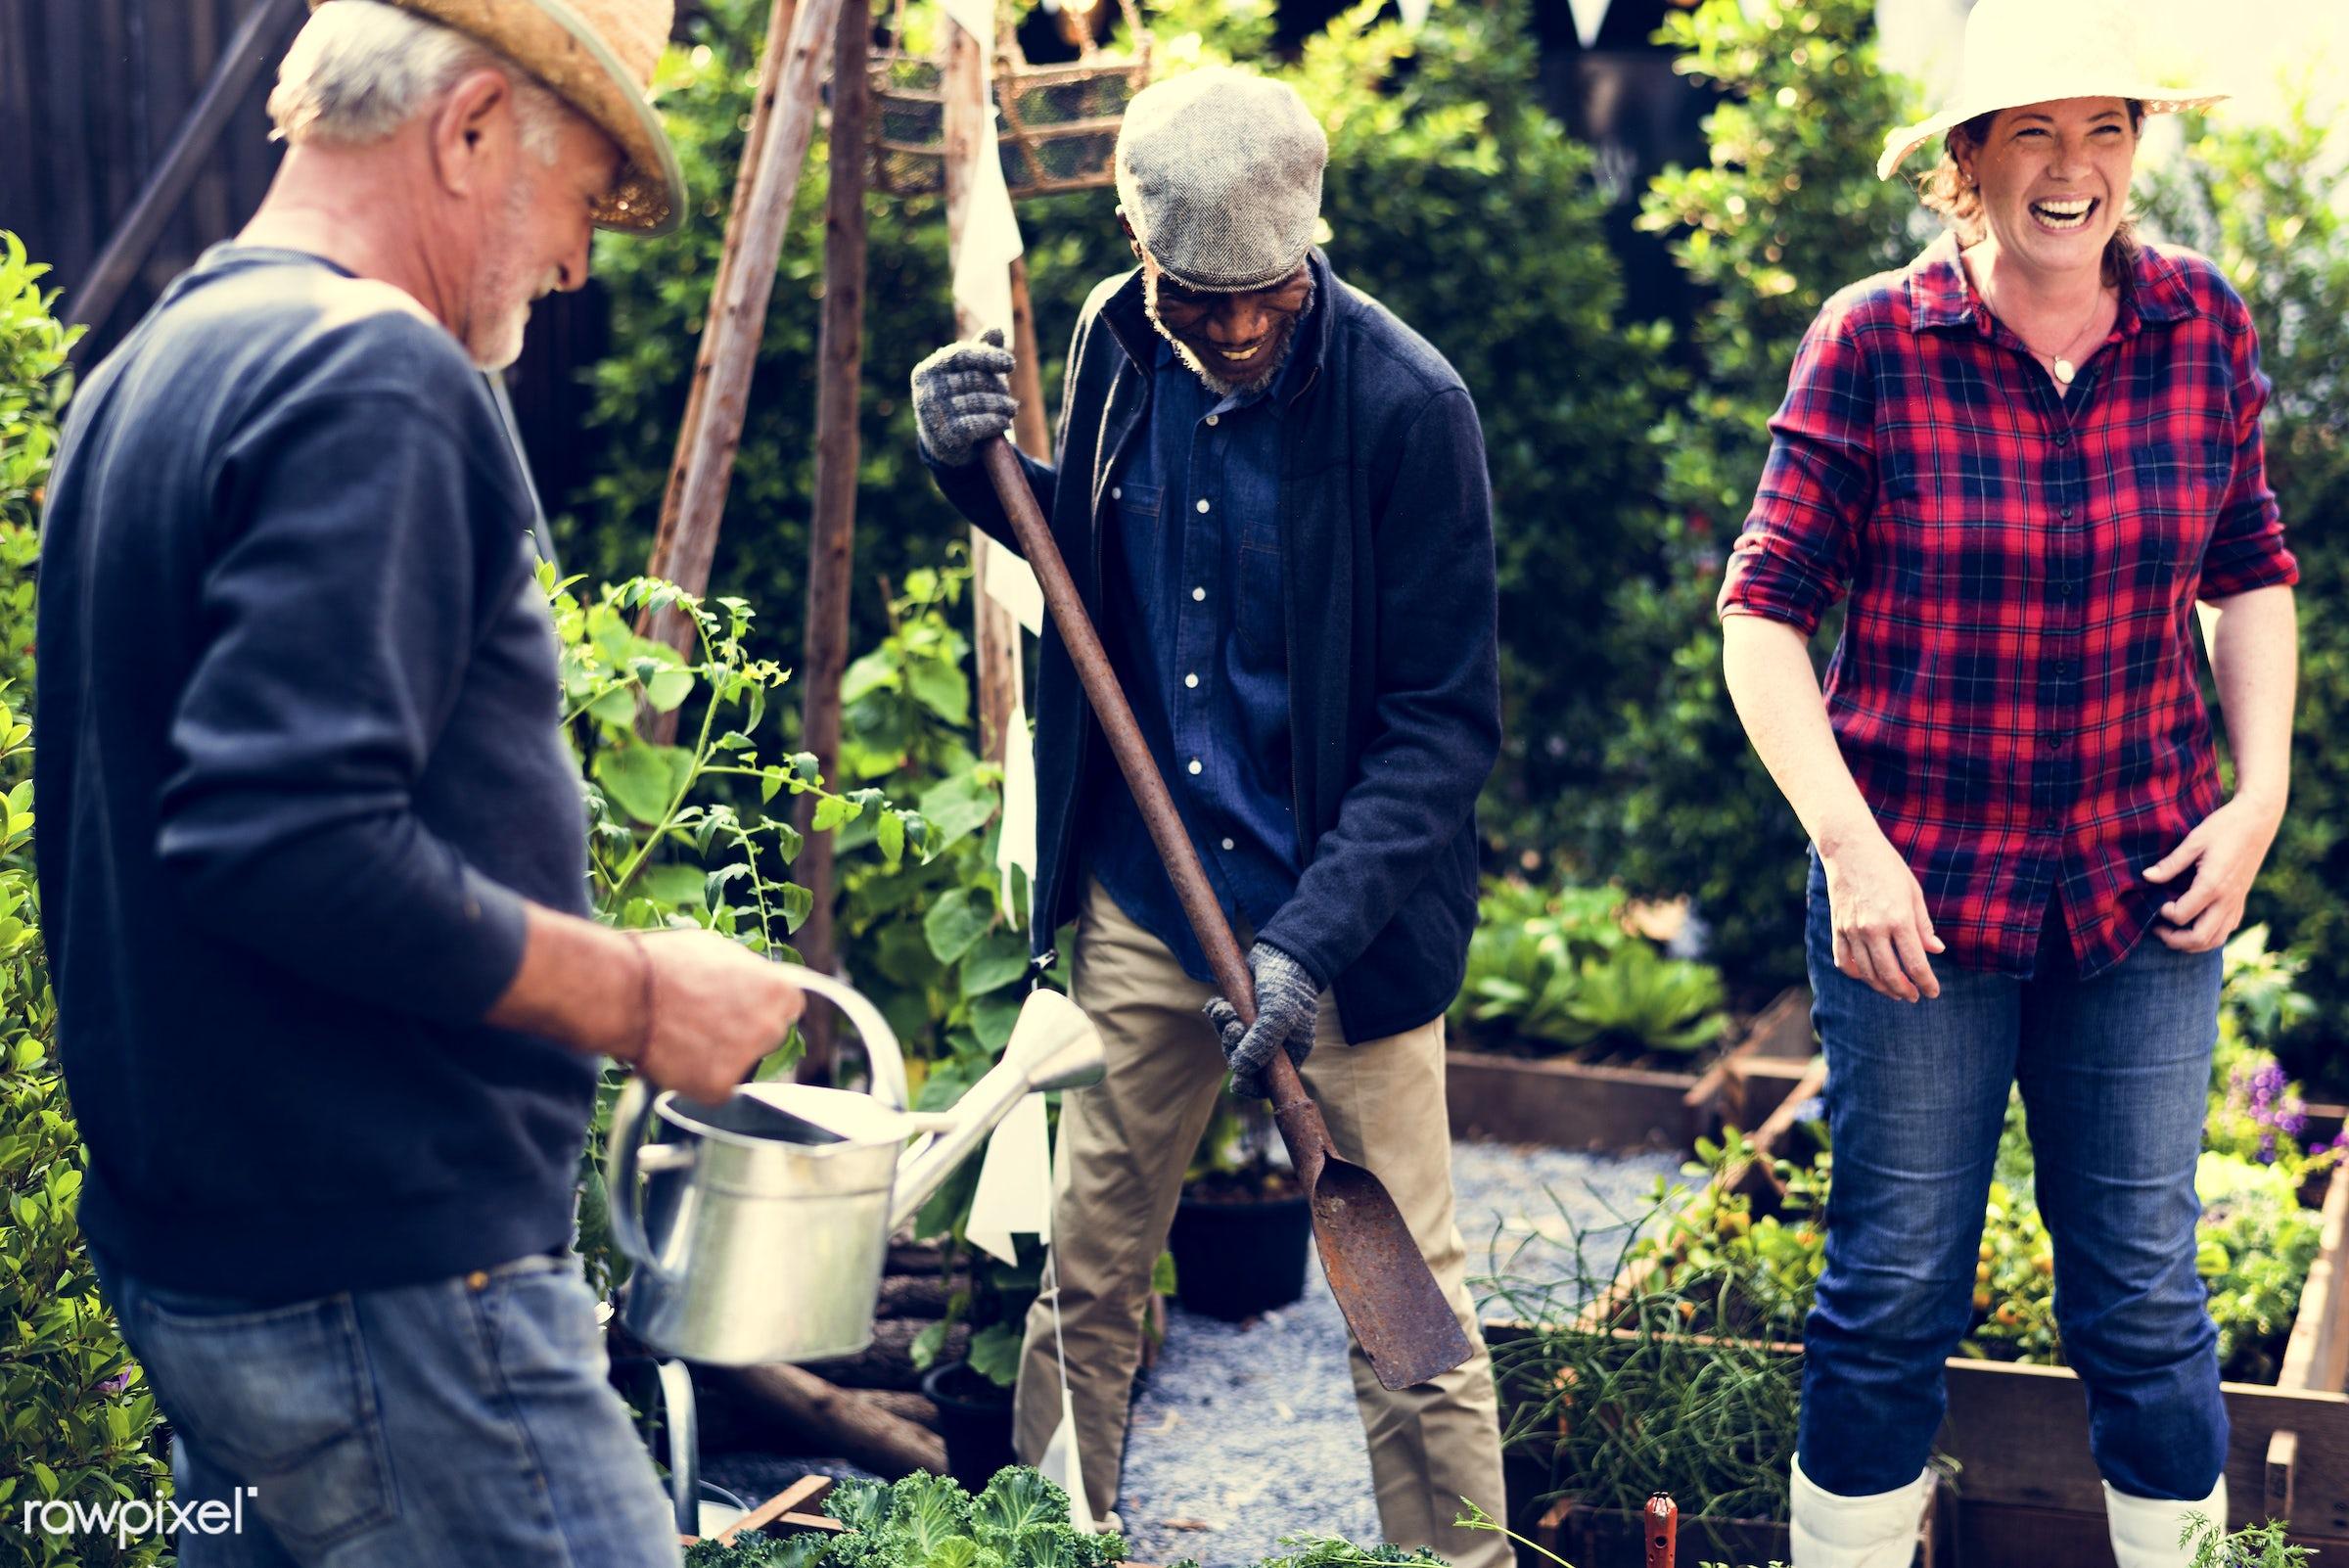 watering, plant, nutritious, greenhouse, friends, farmer, fresh, lettuce, healthy eating, friendship, men, flower, diversity...